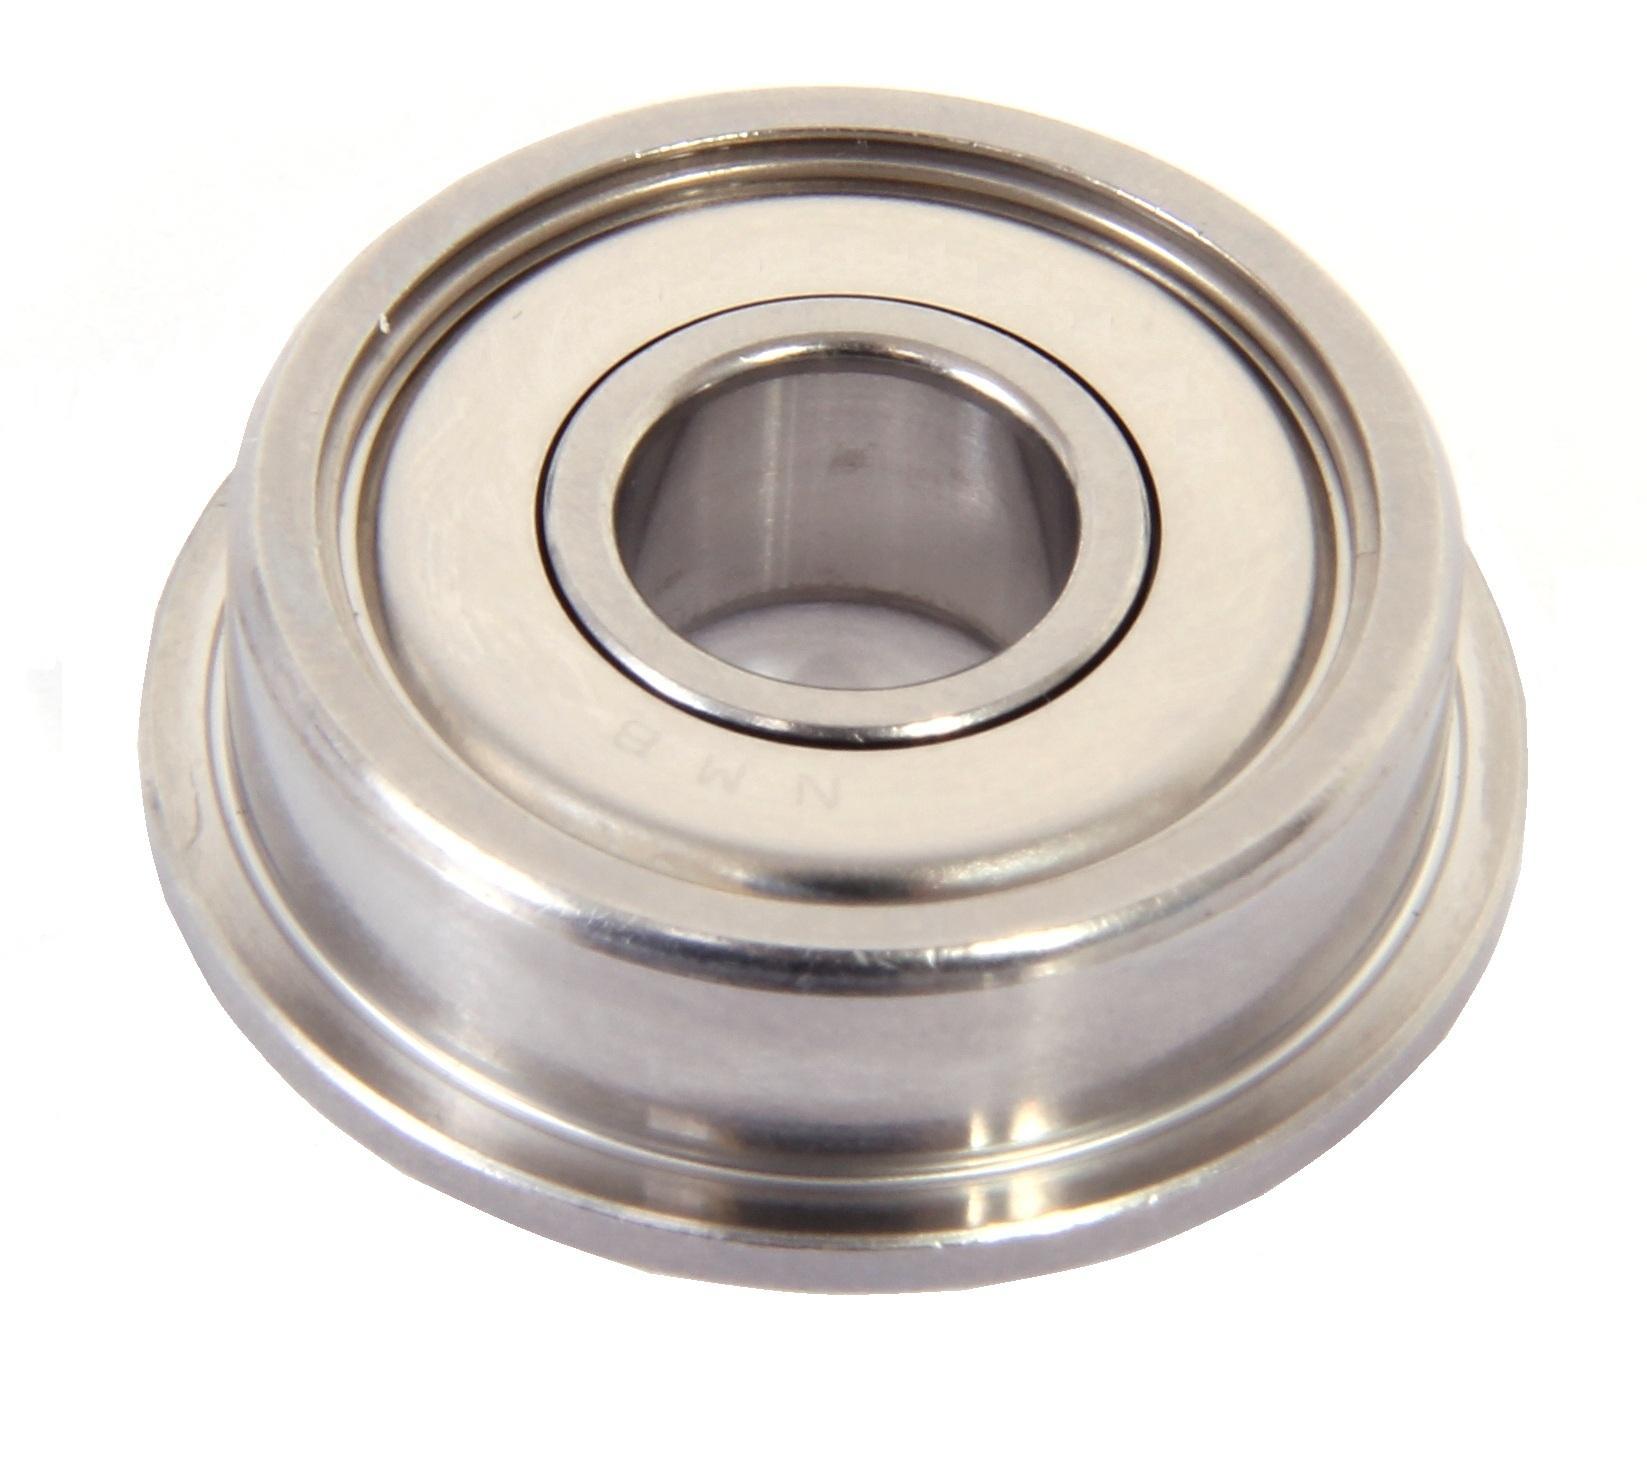 SF684zz 4 PCS 4x9x4 mm Stainless Flanged Ball Bearing Bearings F684zz 4*9*4